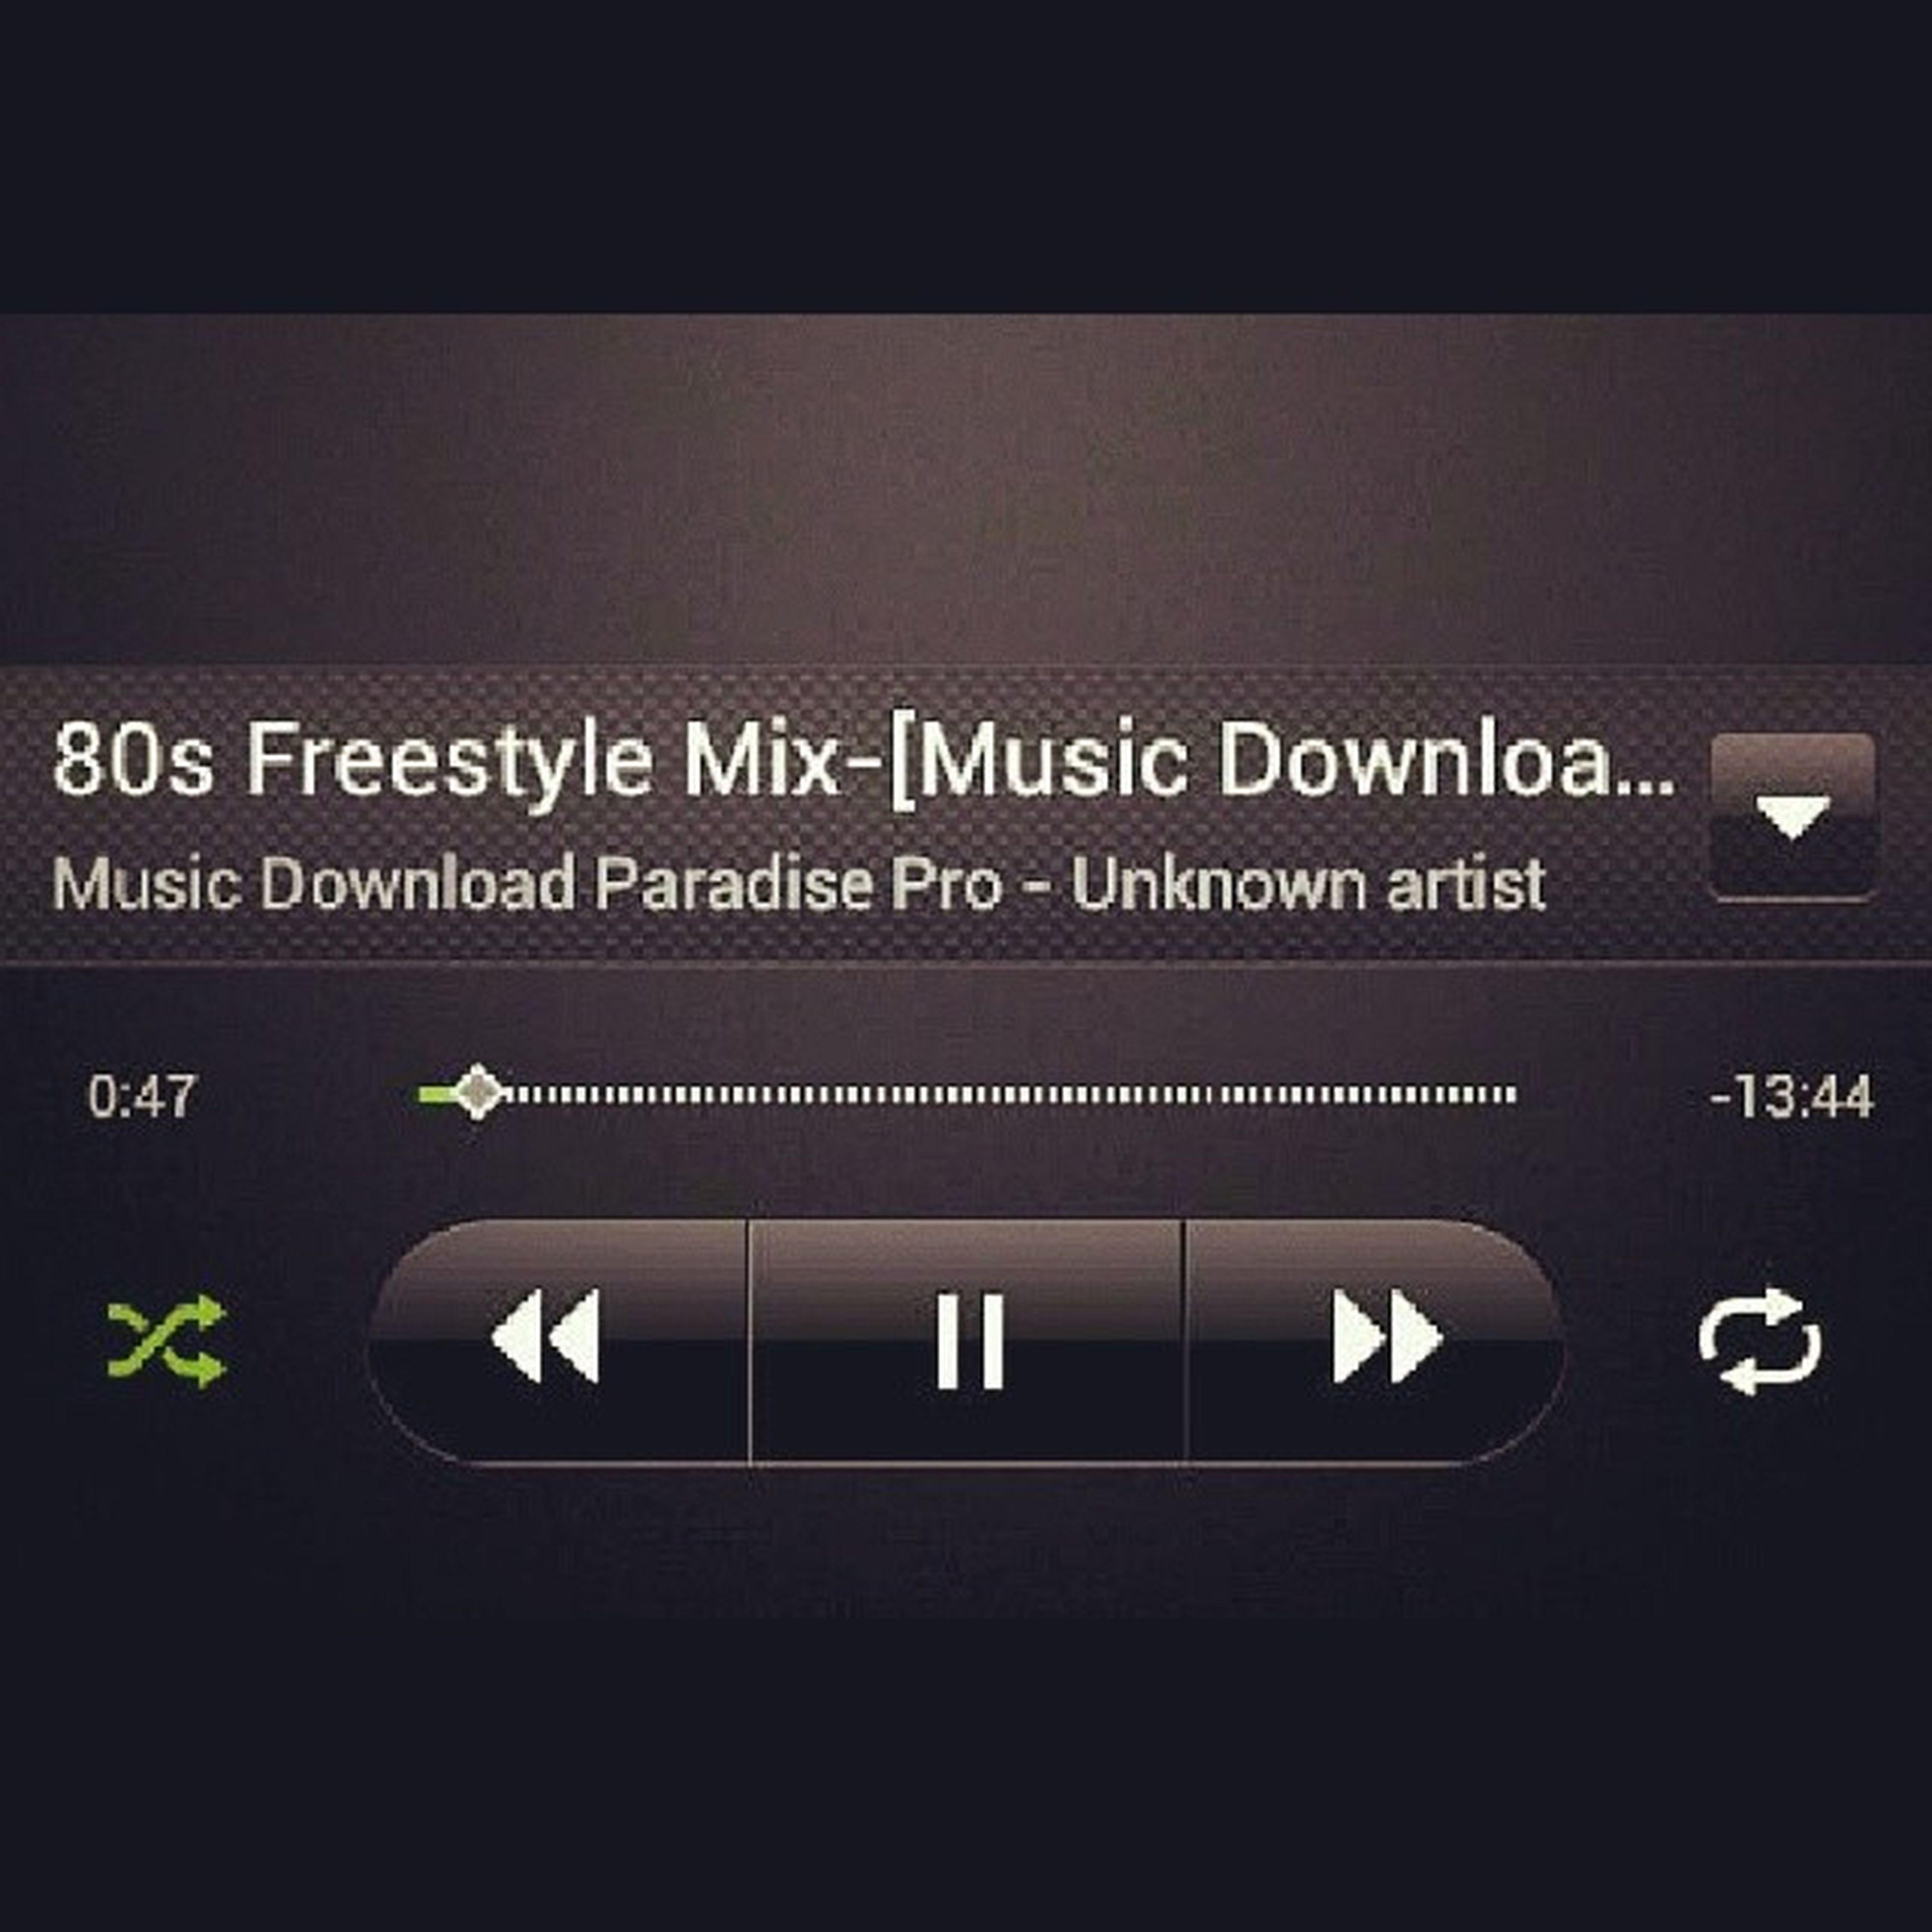 What I will be falling asleep to' Freestyle 80s Chillmusic Memoriesofyou shit fudge ihateyou imBipolar goodnight sweetdreams